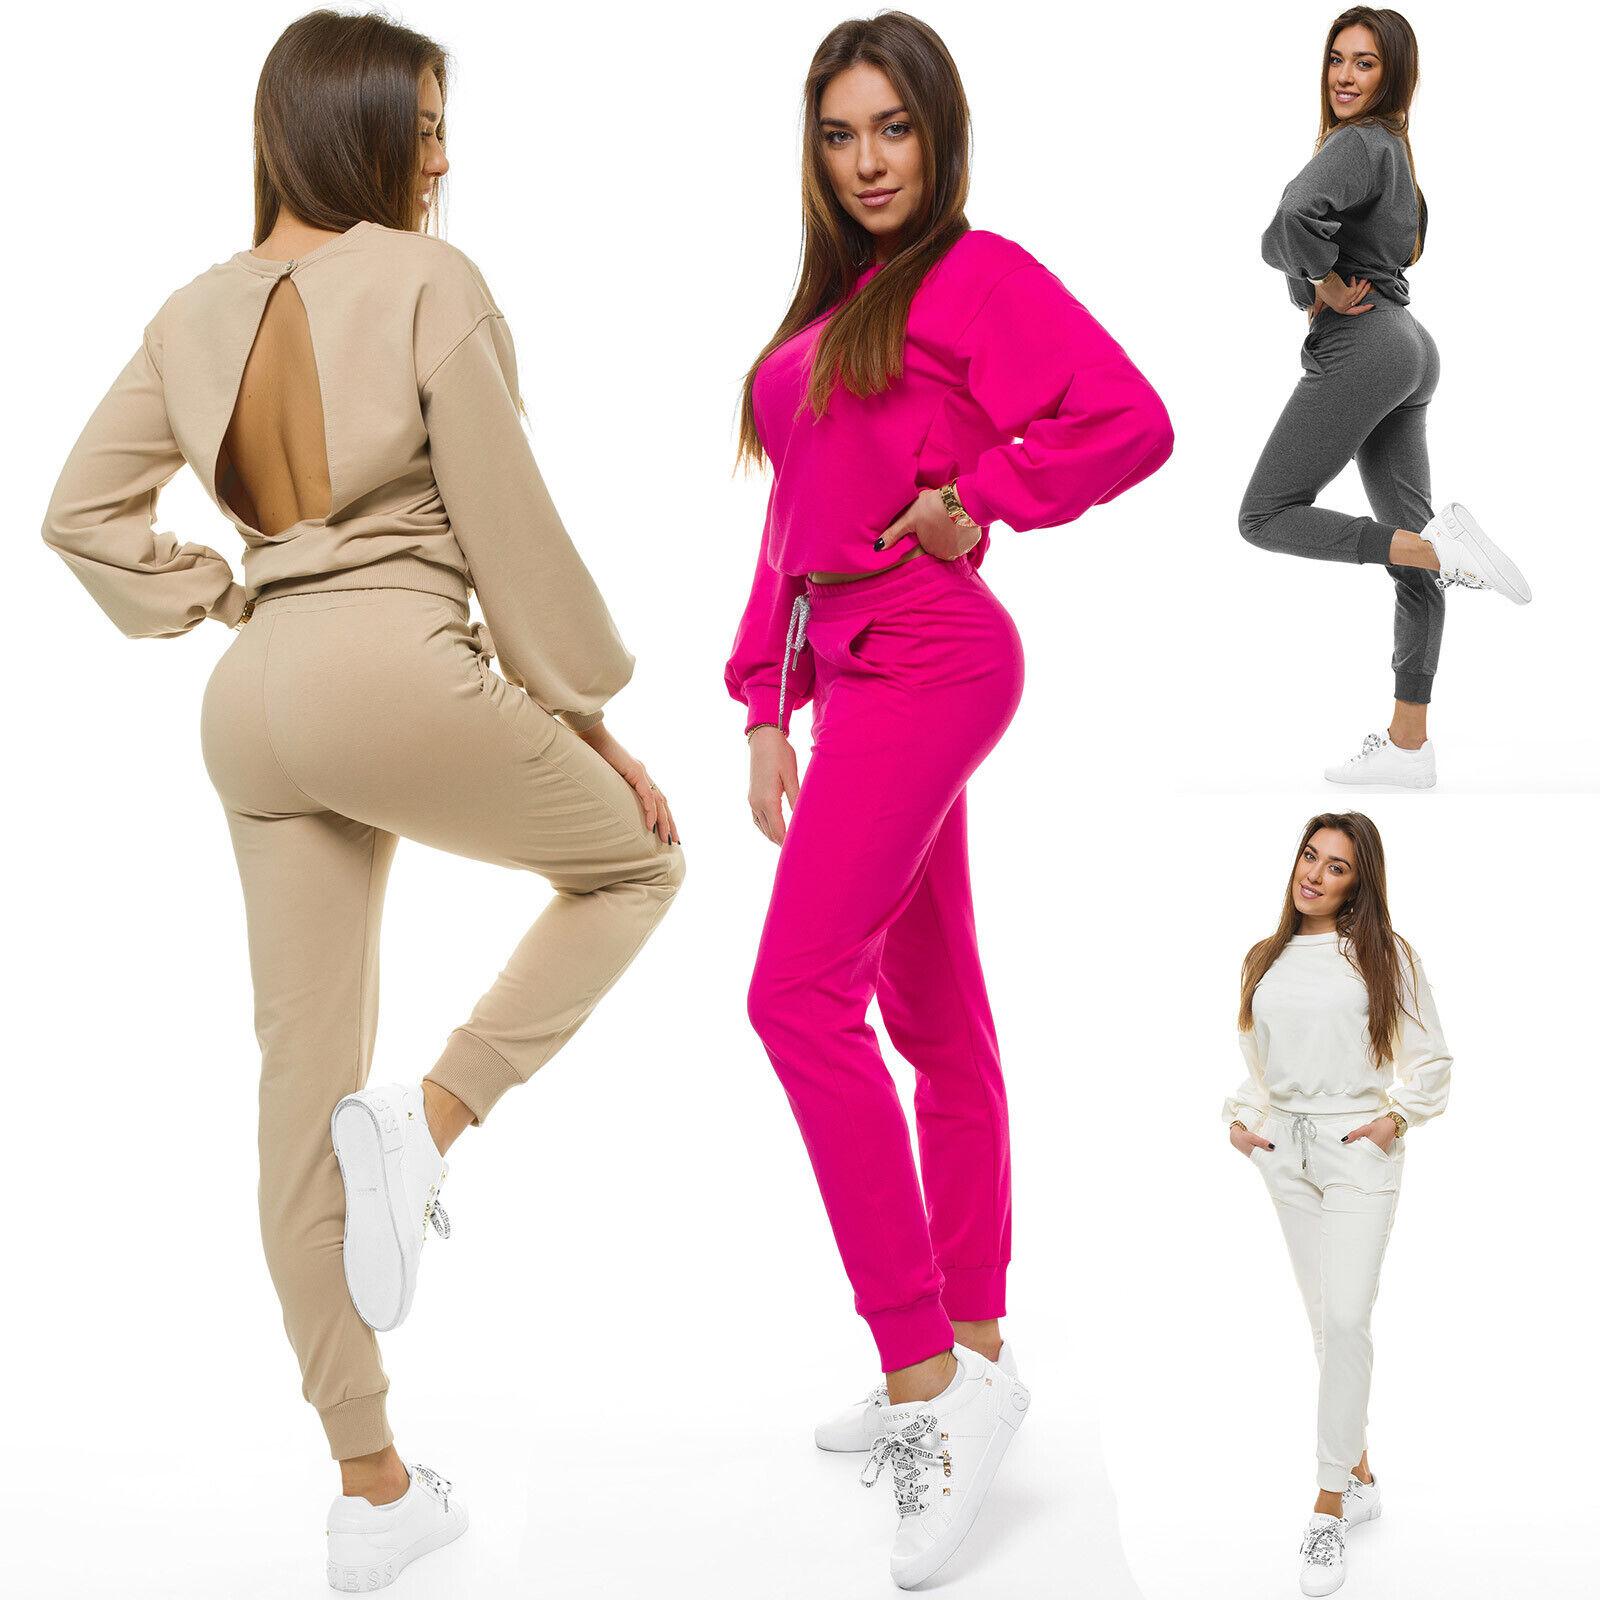 Trainingsanzug Sportanzug Jogginganzug Hose Rückenfrei Sweatshirt Damen OZONEE 3